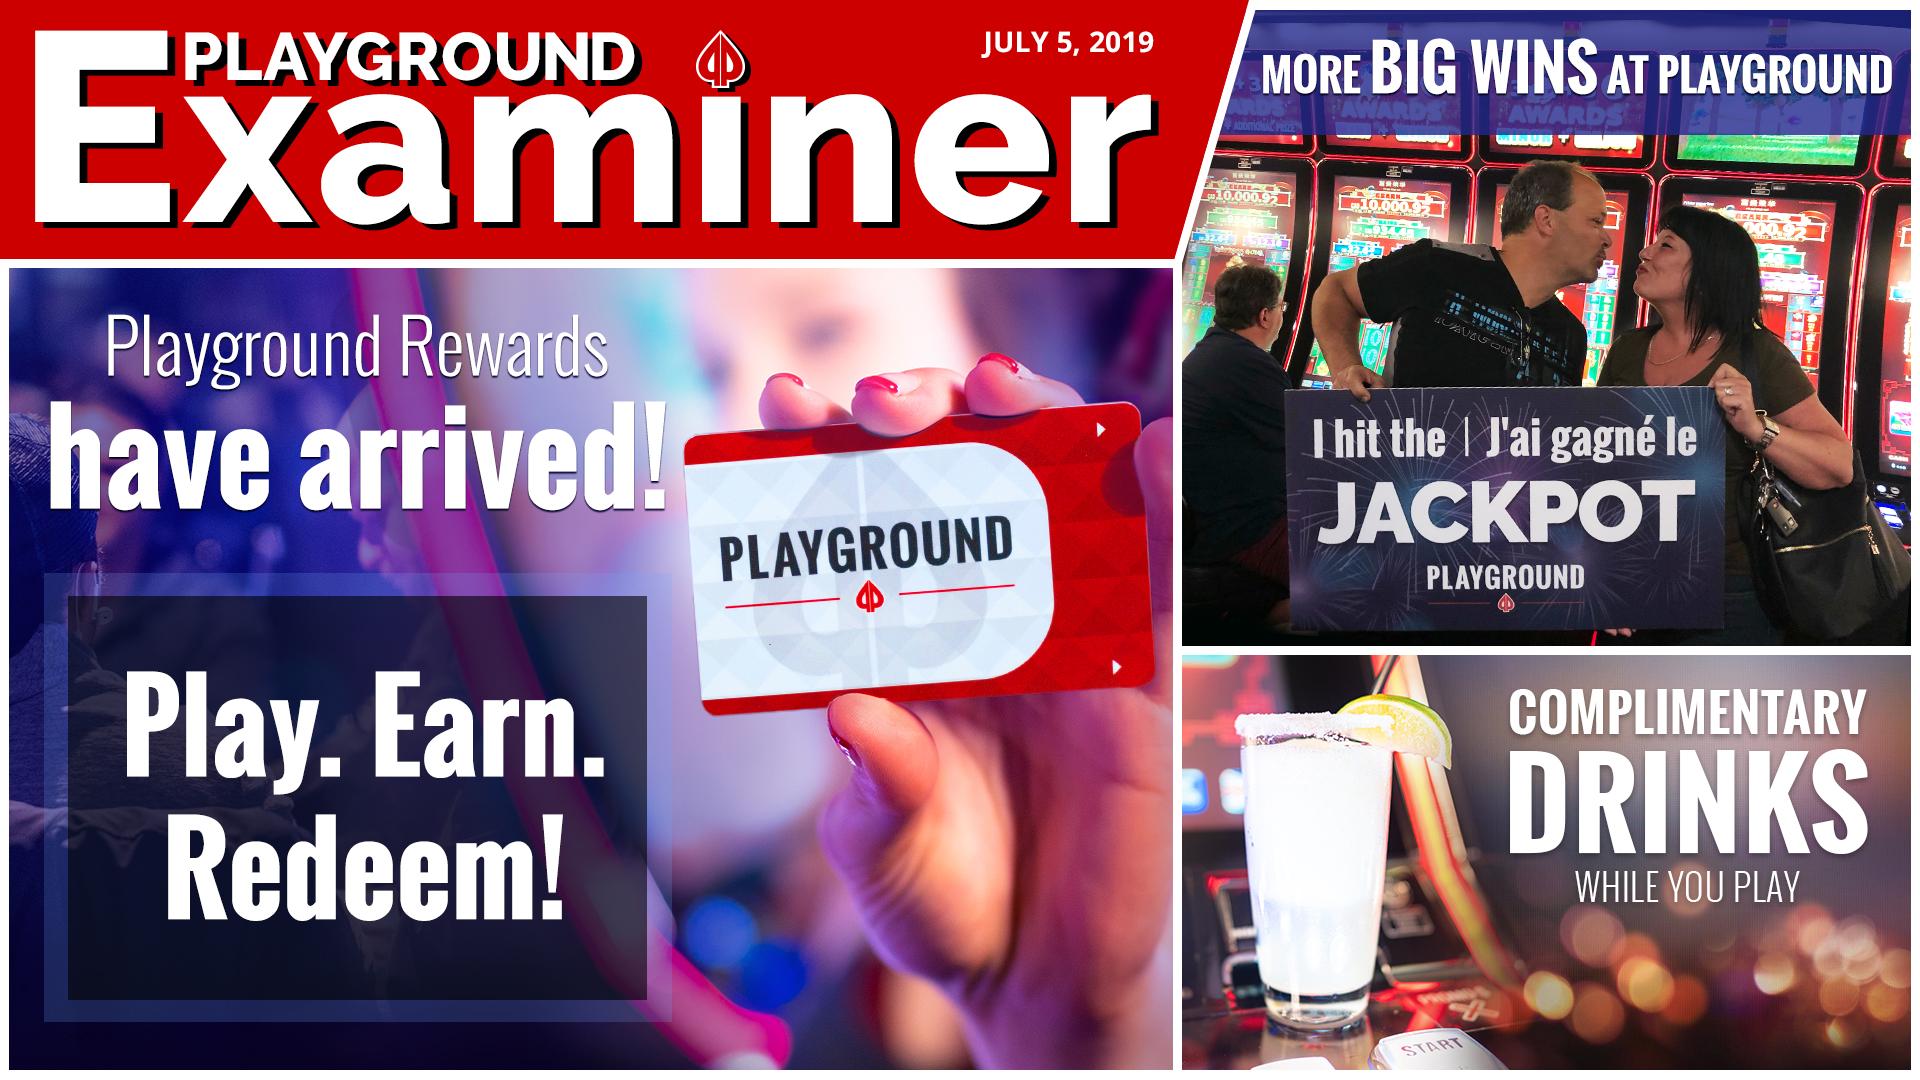 Playground Rewards have arrived!